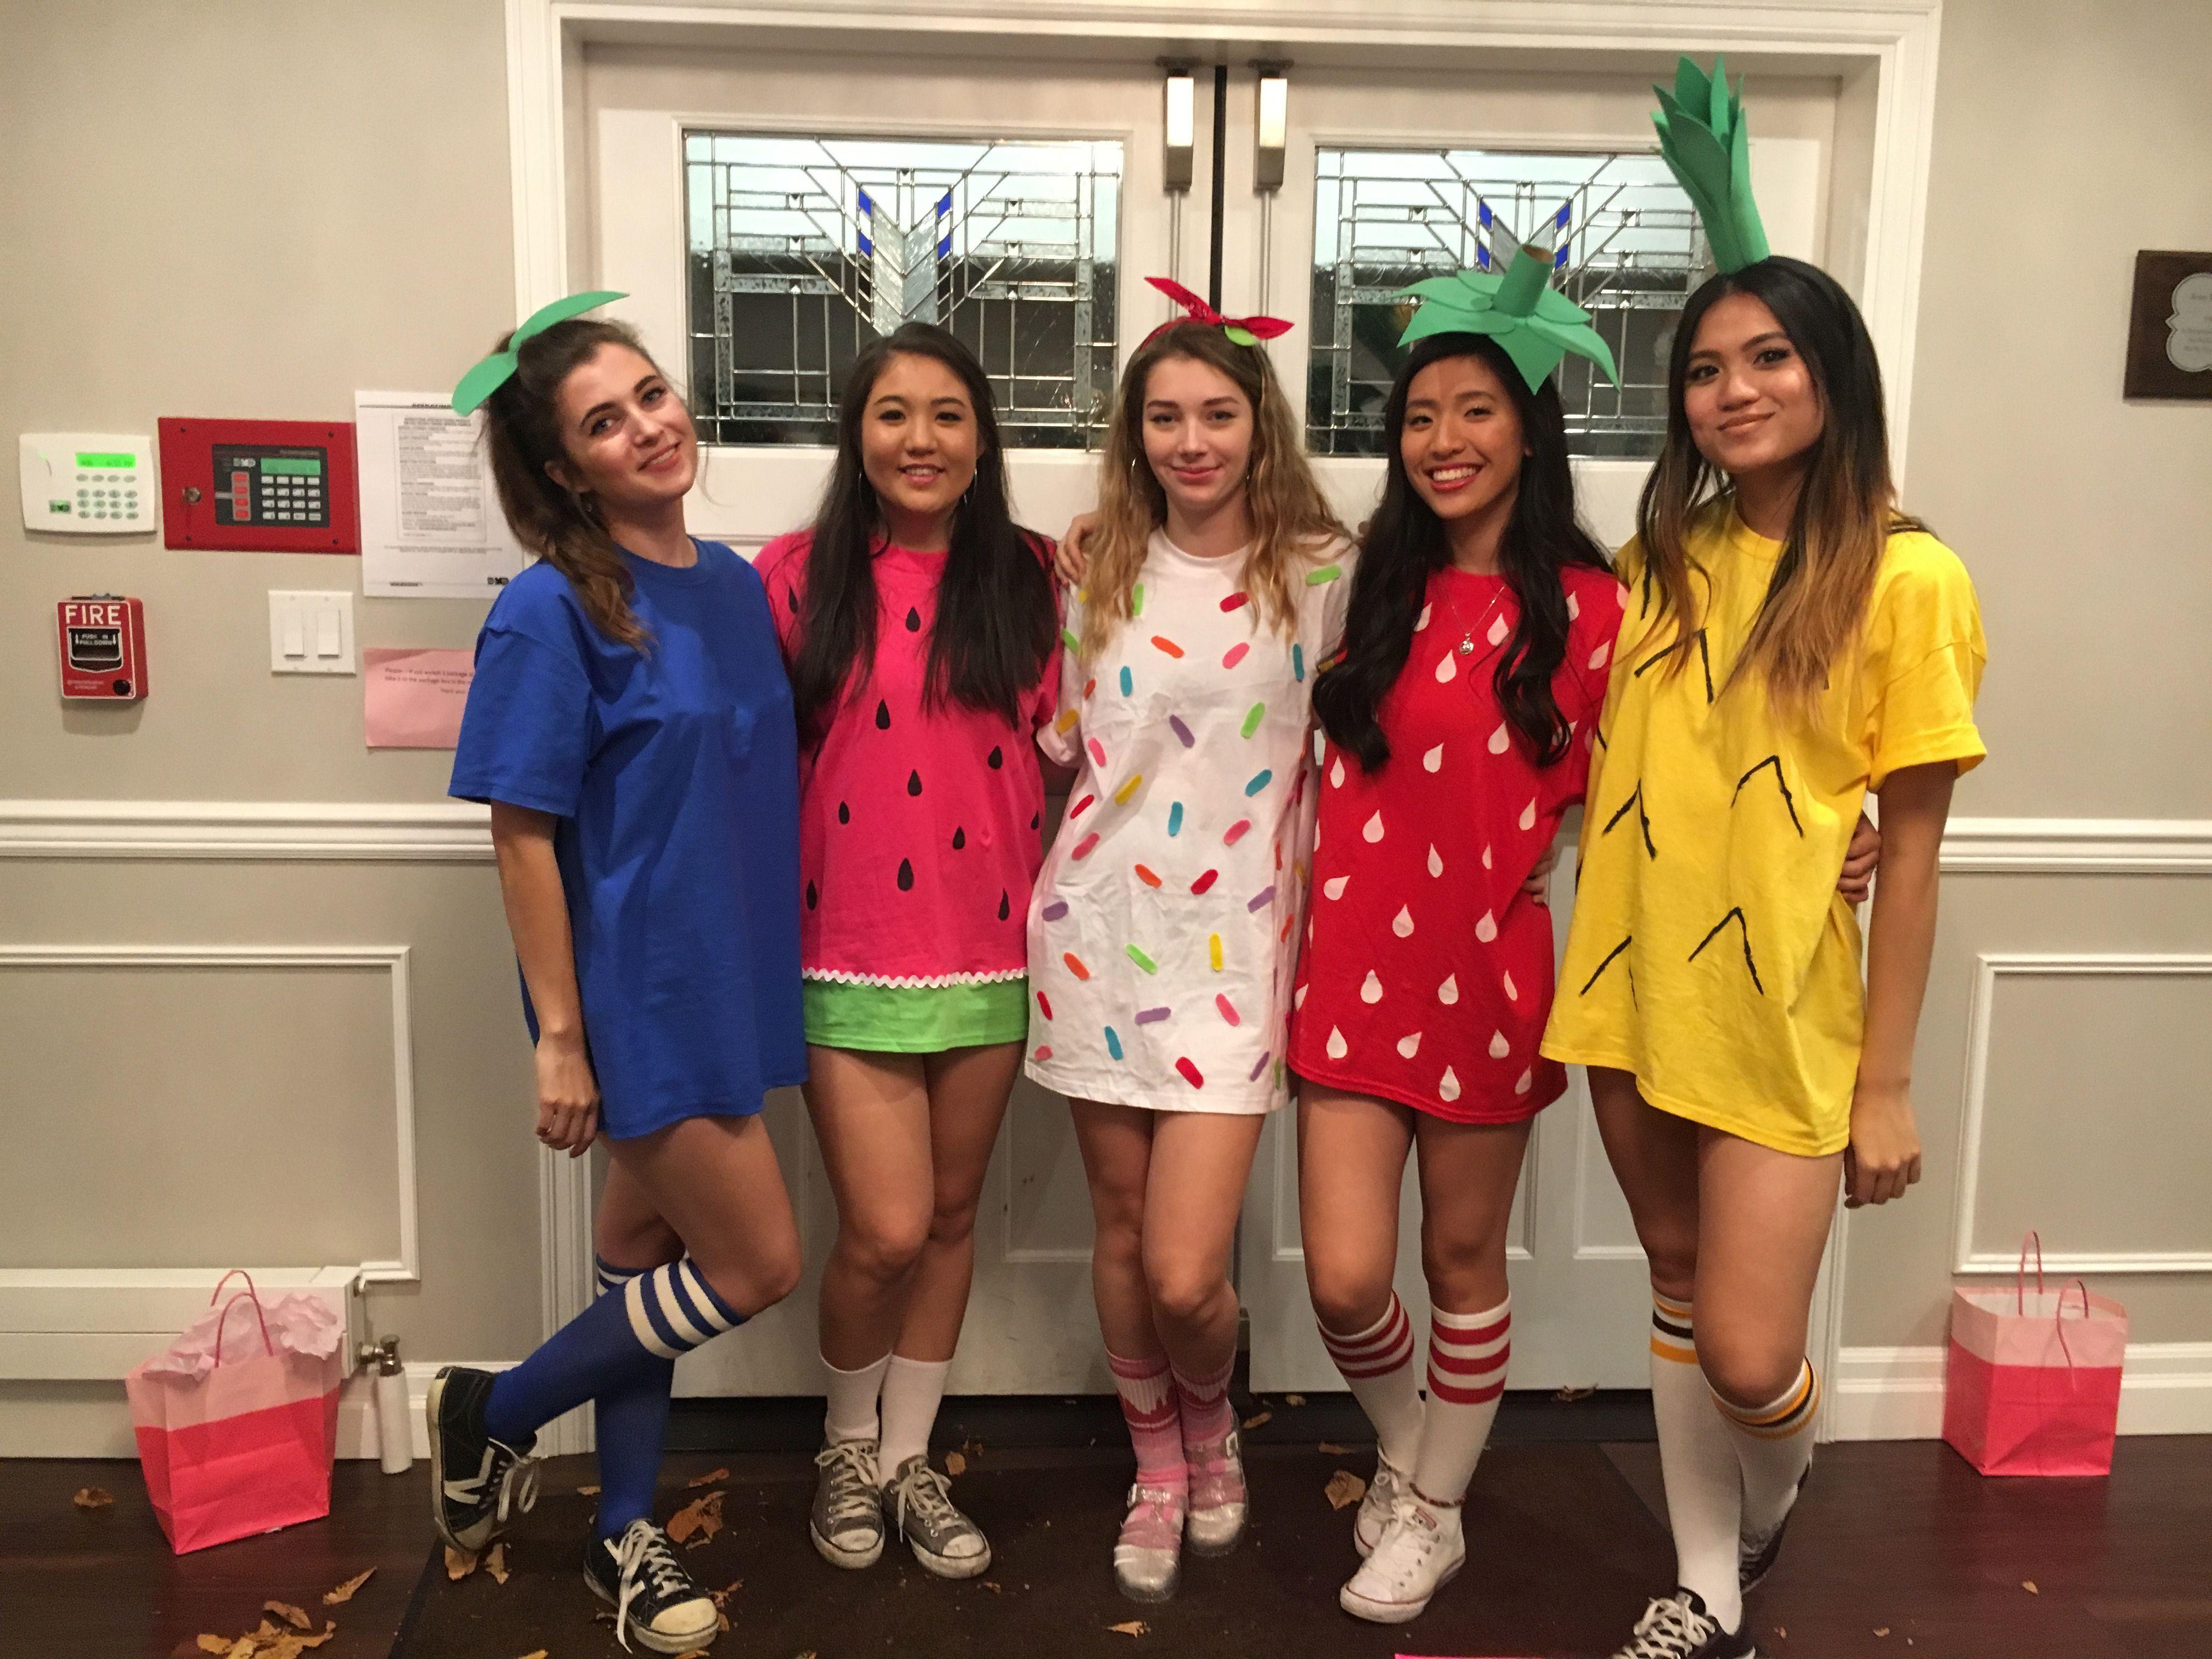 DIY Fruity Halloween Ideas #halloween #fruit #costume #idea